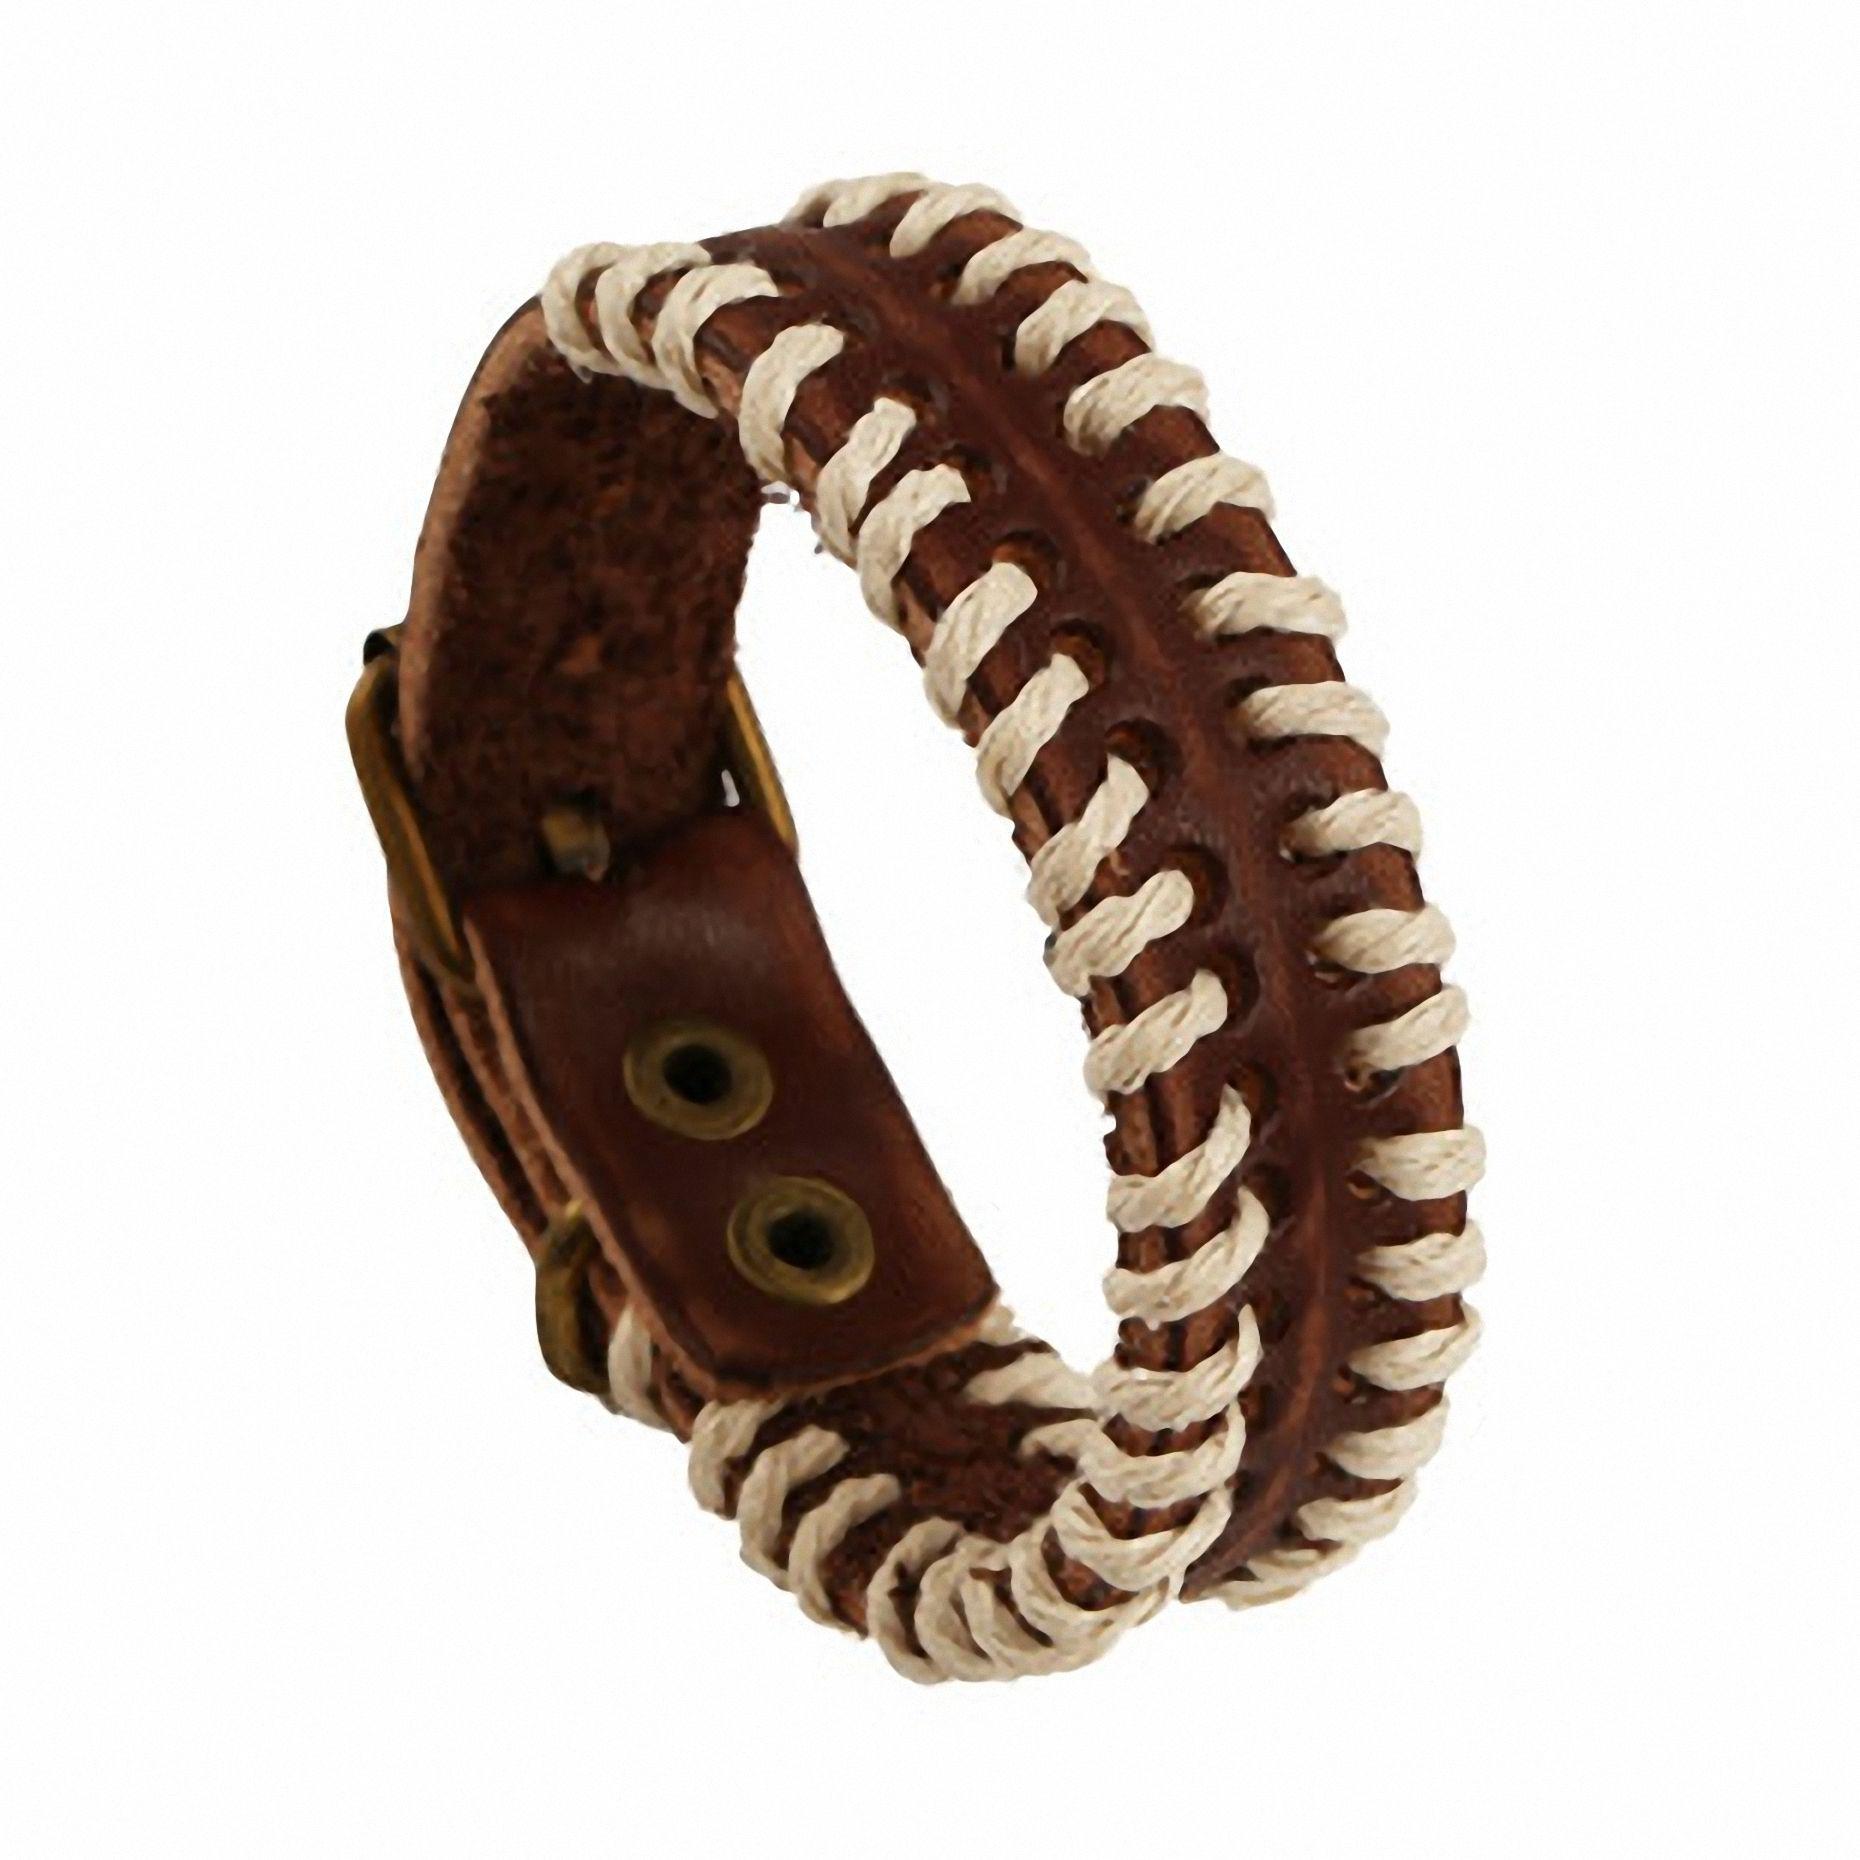 handmade genuine leather  hand woven cool high quality bracelet